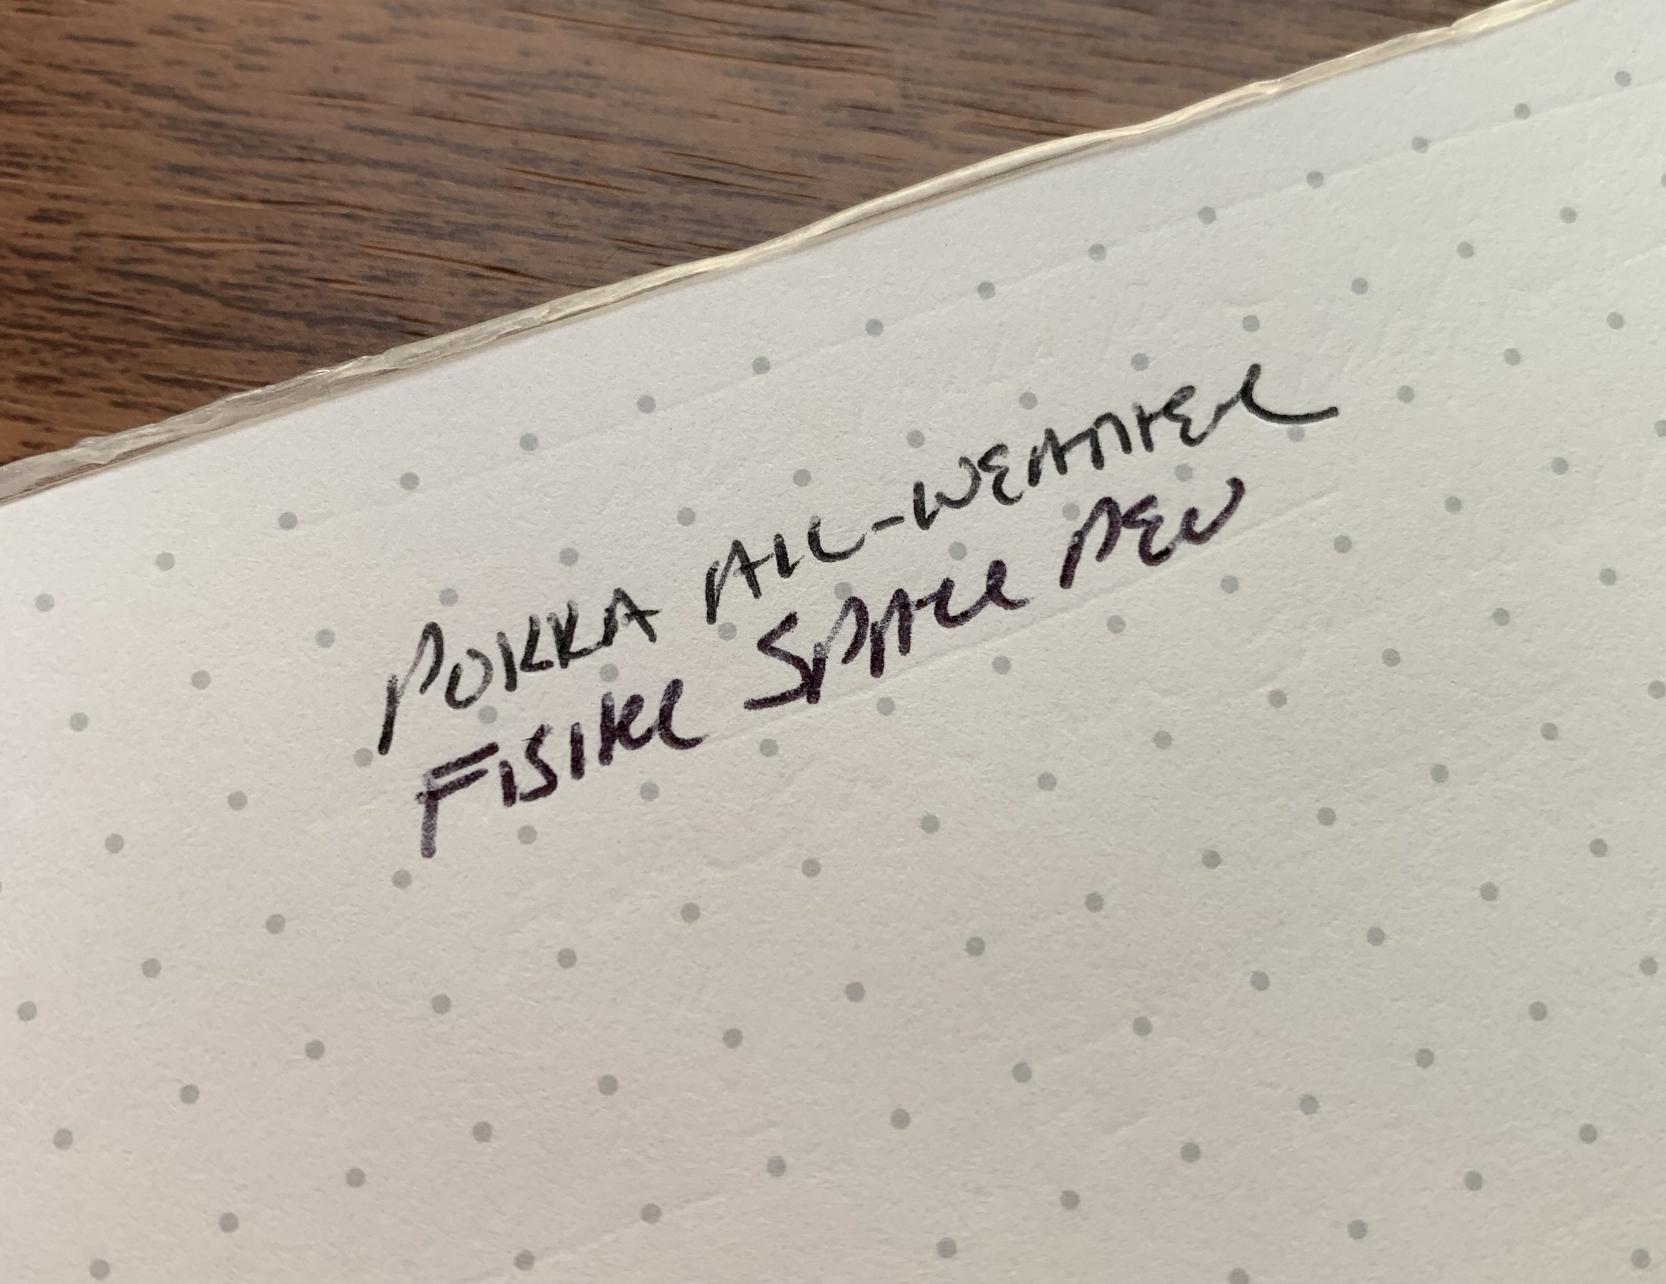 Pokka-Pen-Writing-Sample